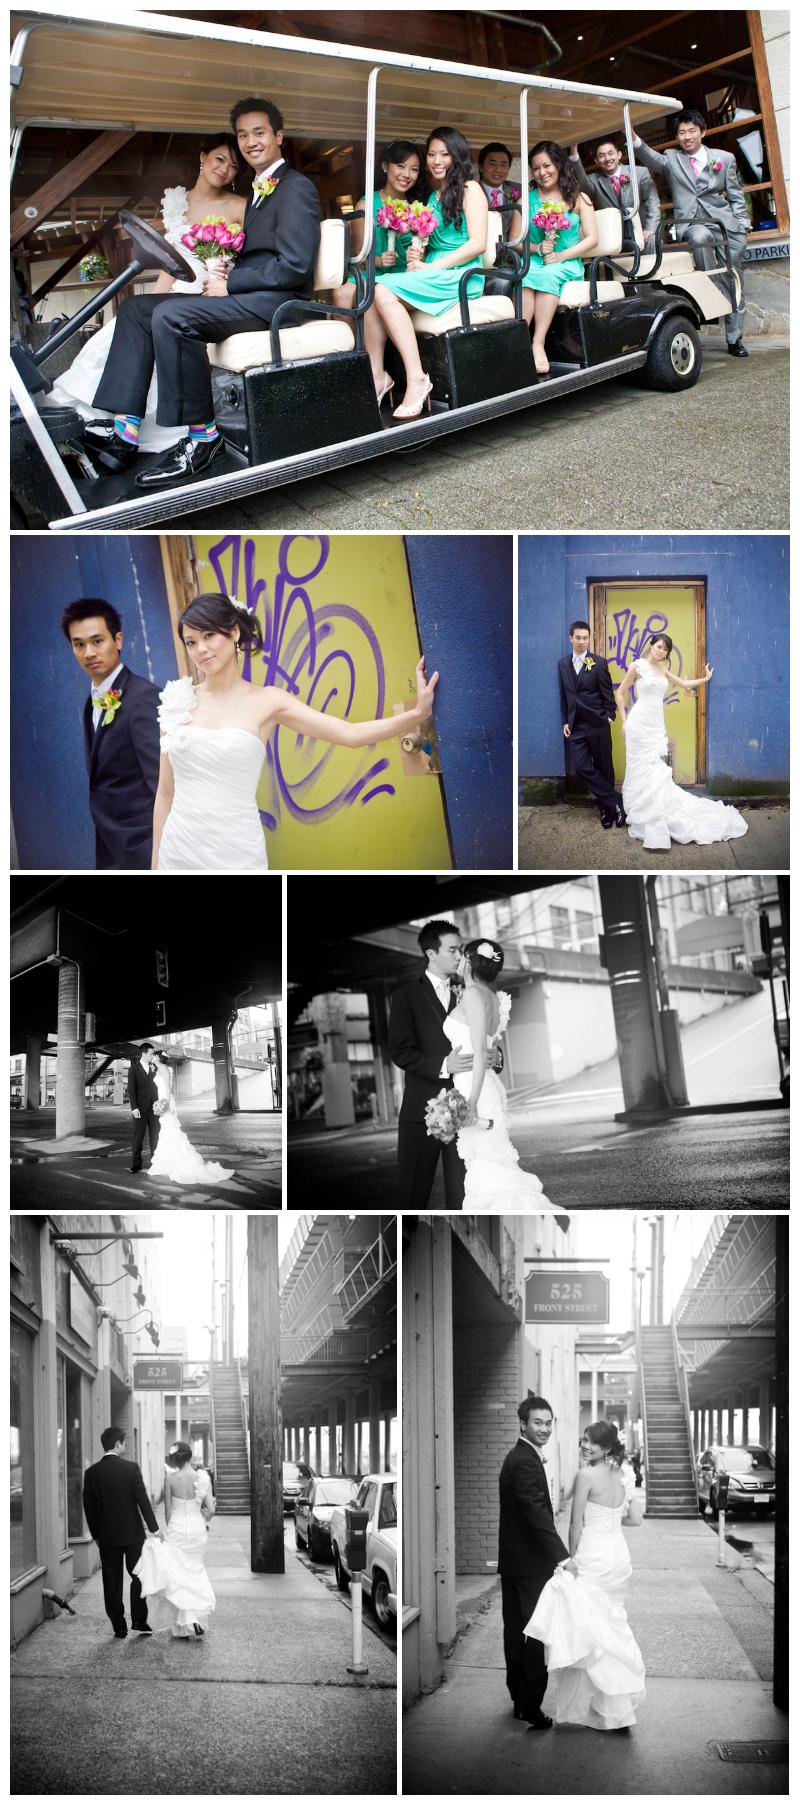 golf cart, bridal party, wedding portraits, wedding photos, urban, alley, new west, hip, b&w, front st, wedding photography